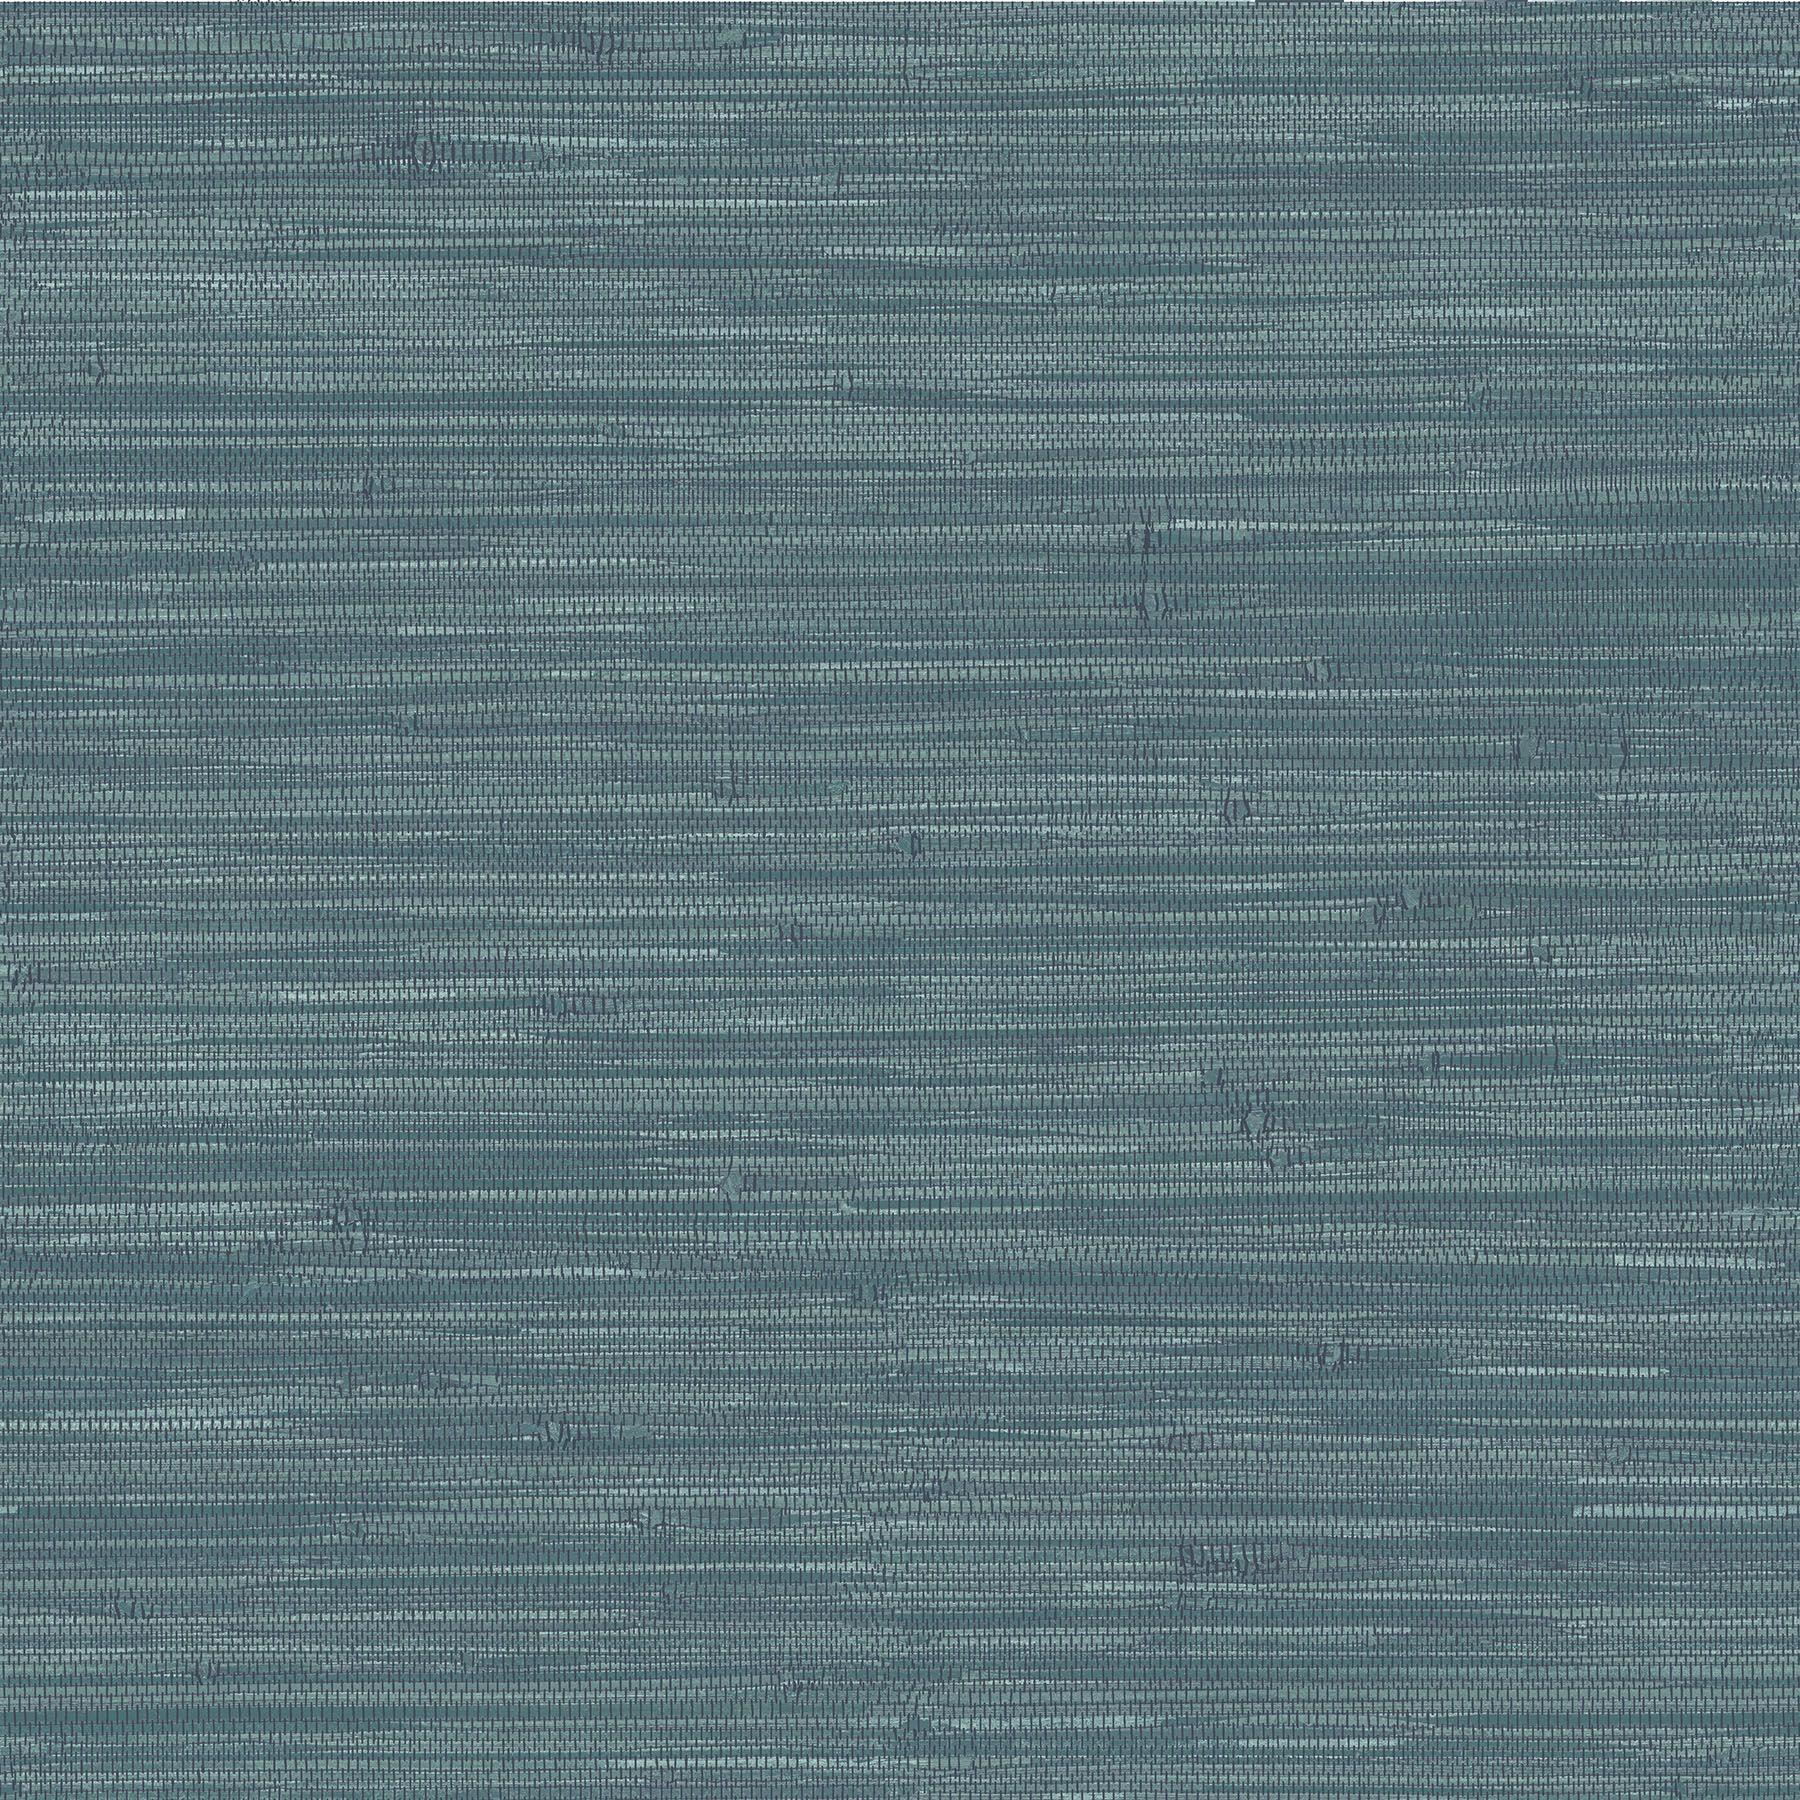 Nuwallpaper Steel Blue Grassweave Raised Ink Peel Stick Wallpaper Walmart Com In 2021 Nuwallpaper Peel And Stick Wallpaper Grasscloth Wallpaper